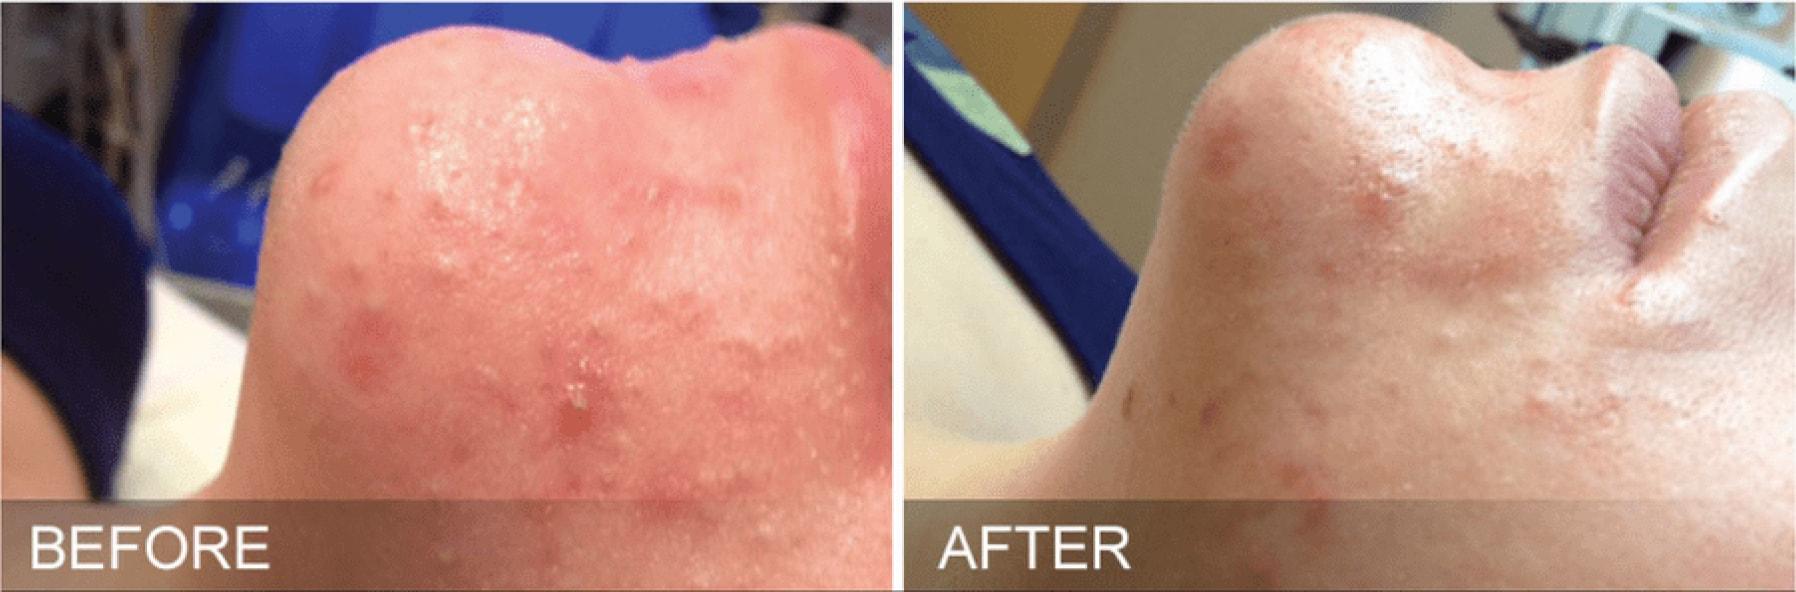 HydraFacial acne results